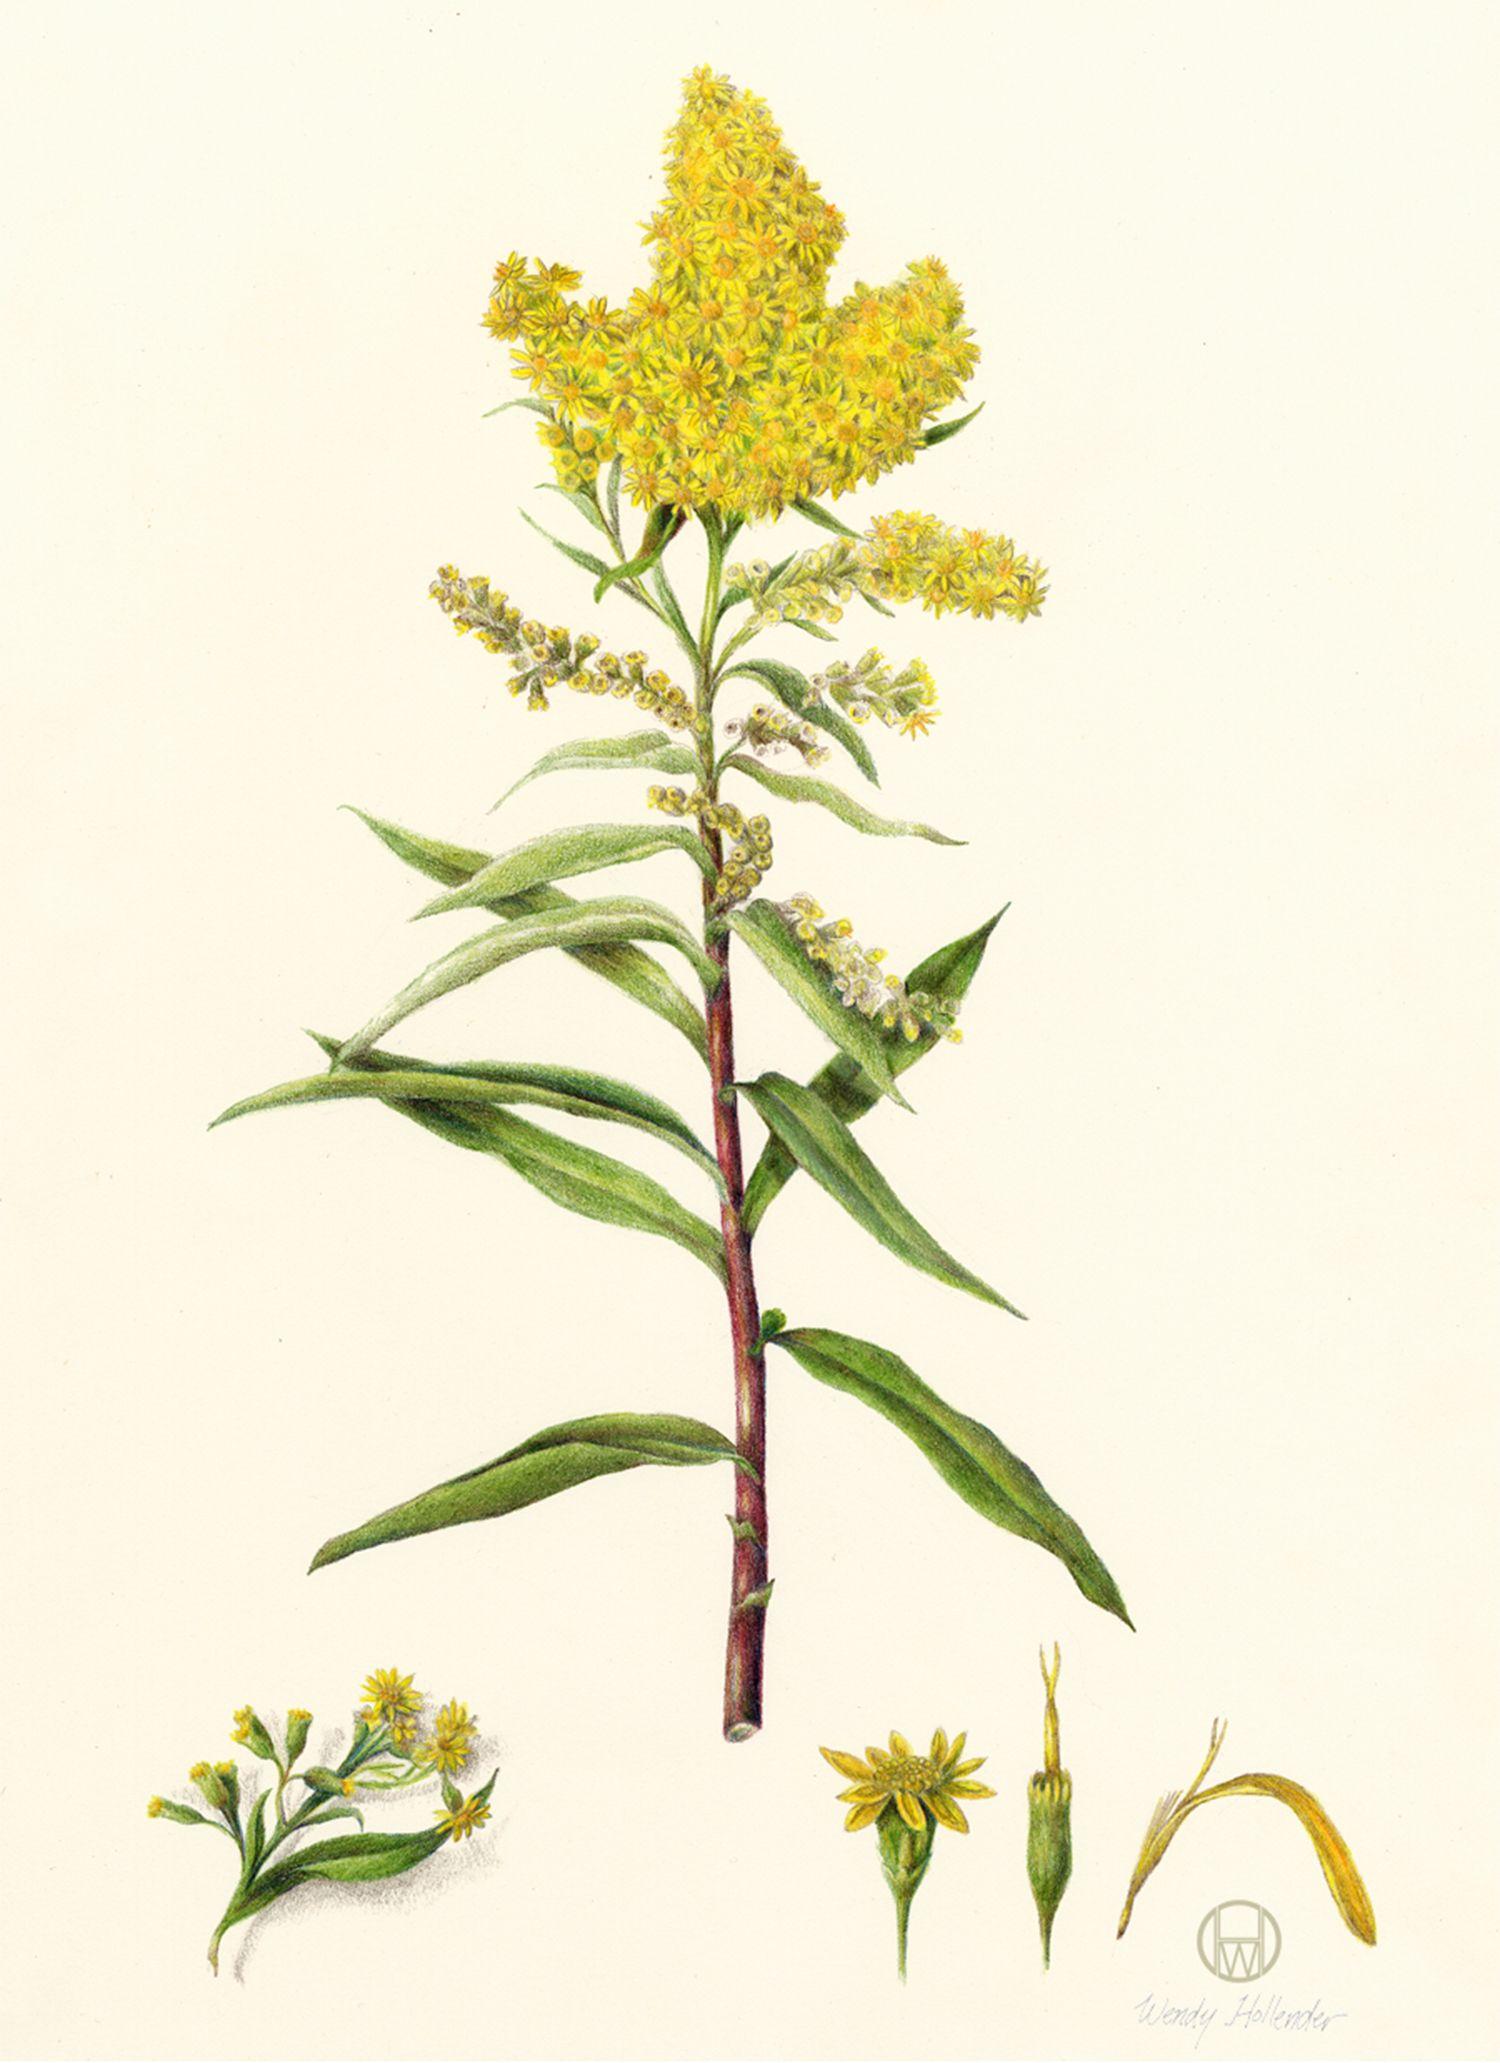 Seaside Goldenrod Solidago Sempervirens Goldenrod Flower Plant Illustration Botanical Flowers